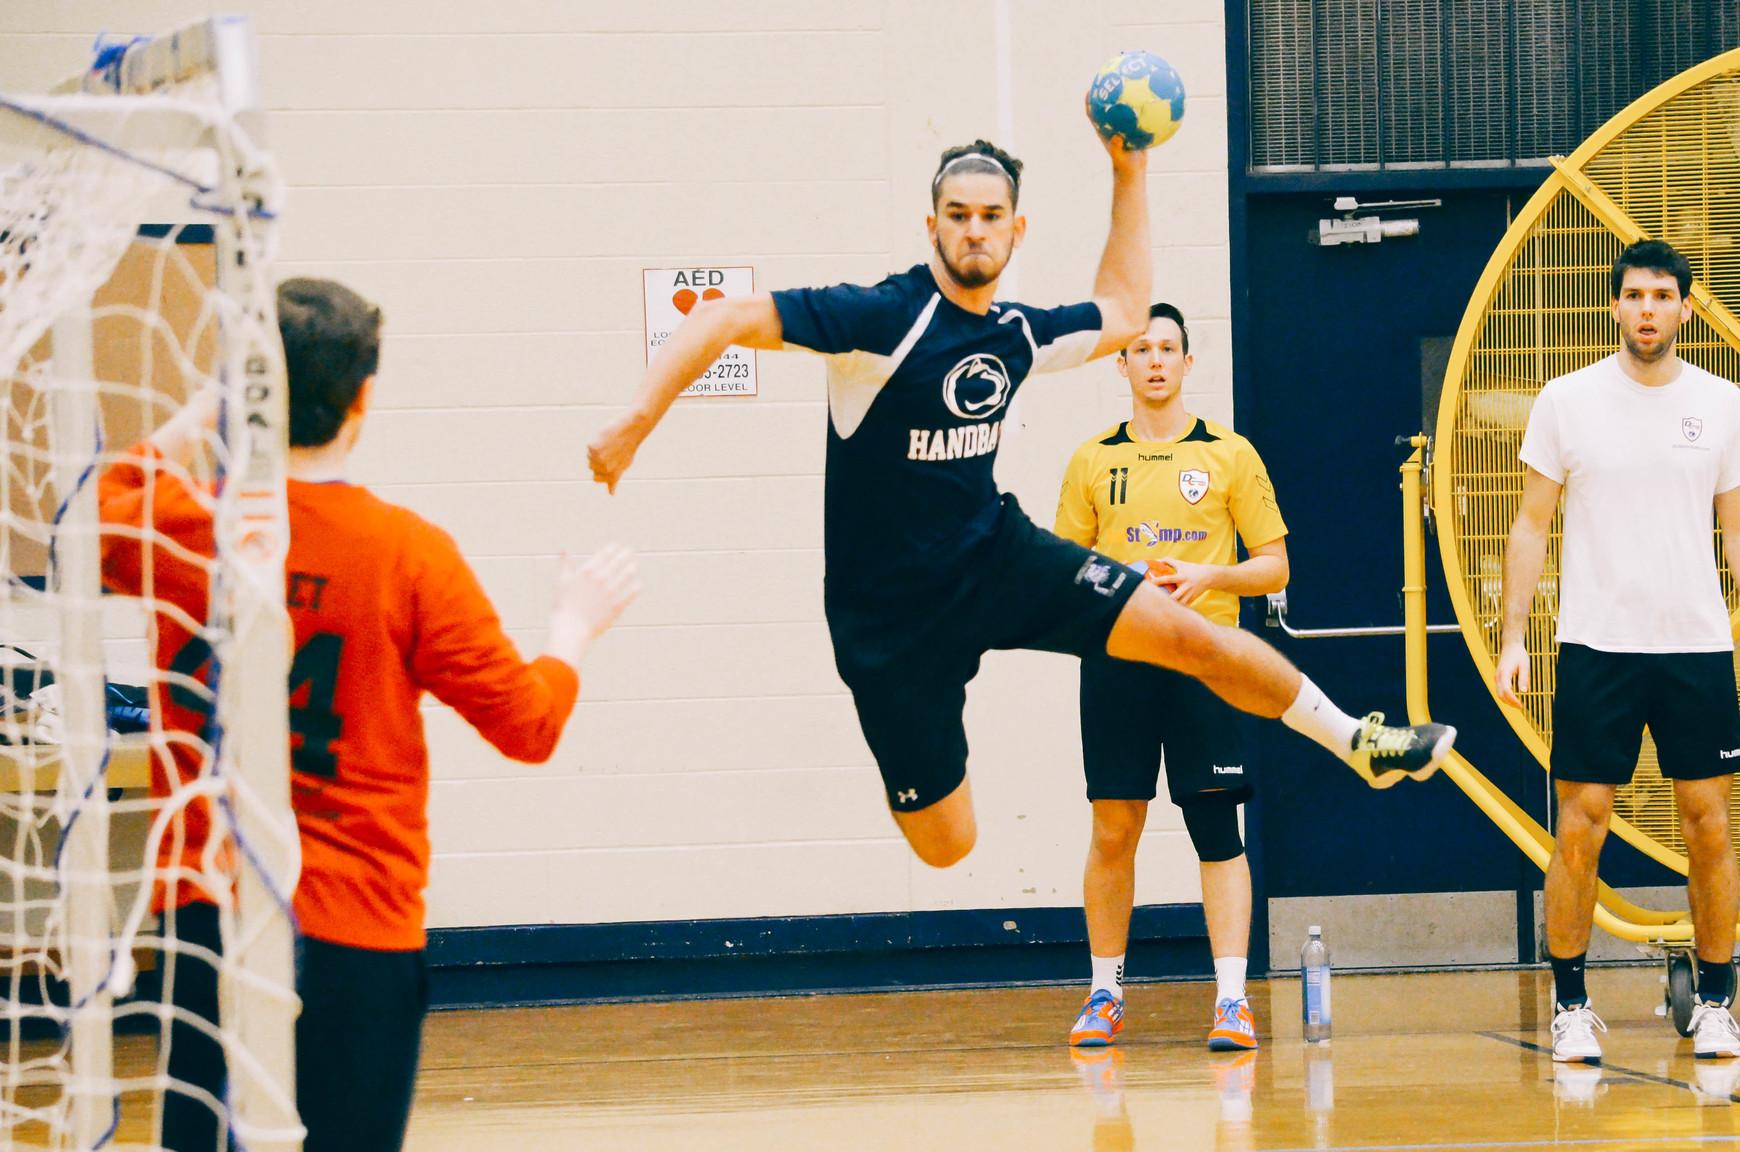 Team handball court